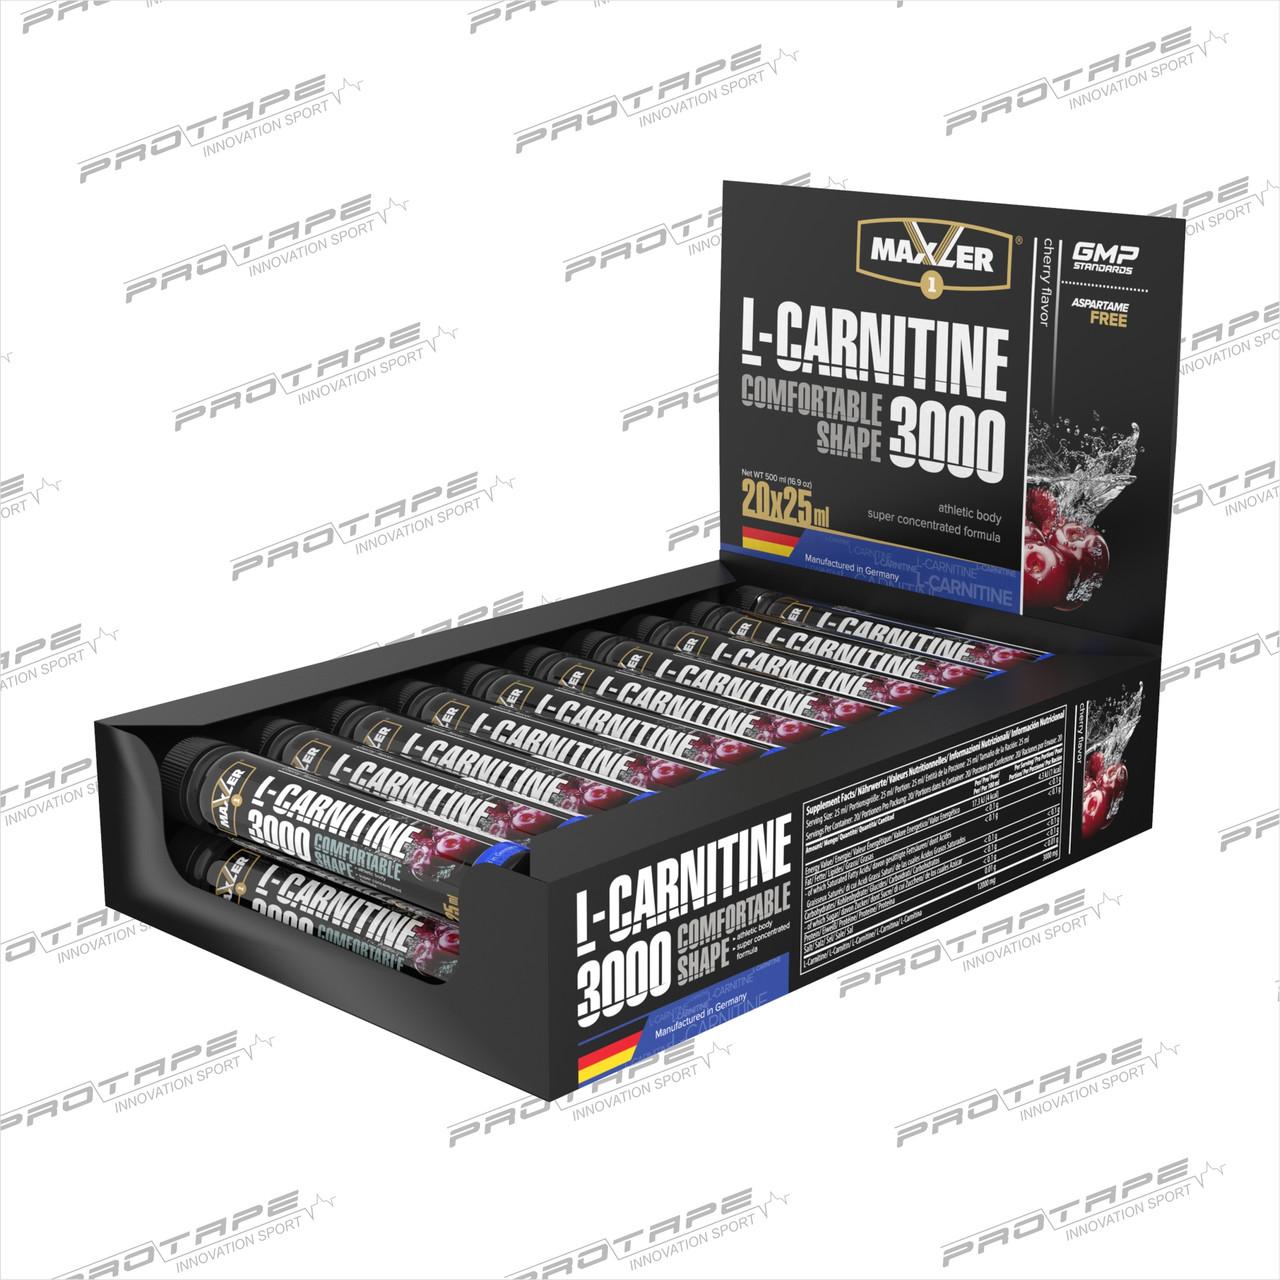 L-карнитин Maxler L-Carnitin 3000, 25 х 20 ампул.